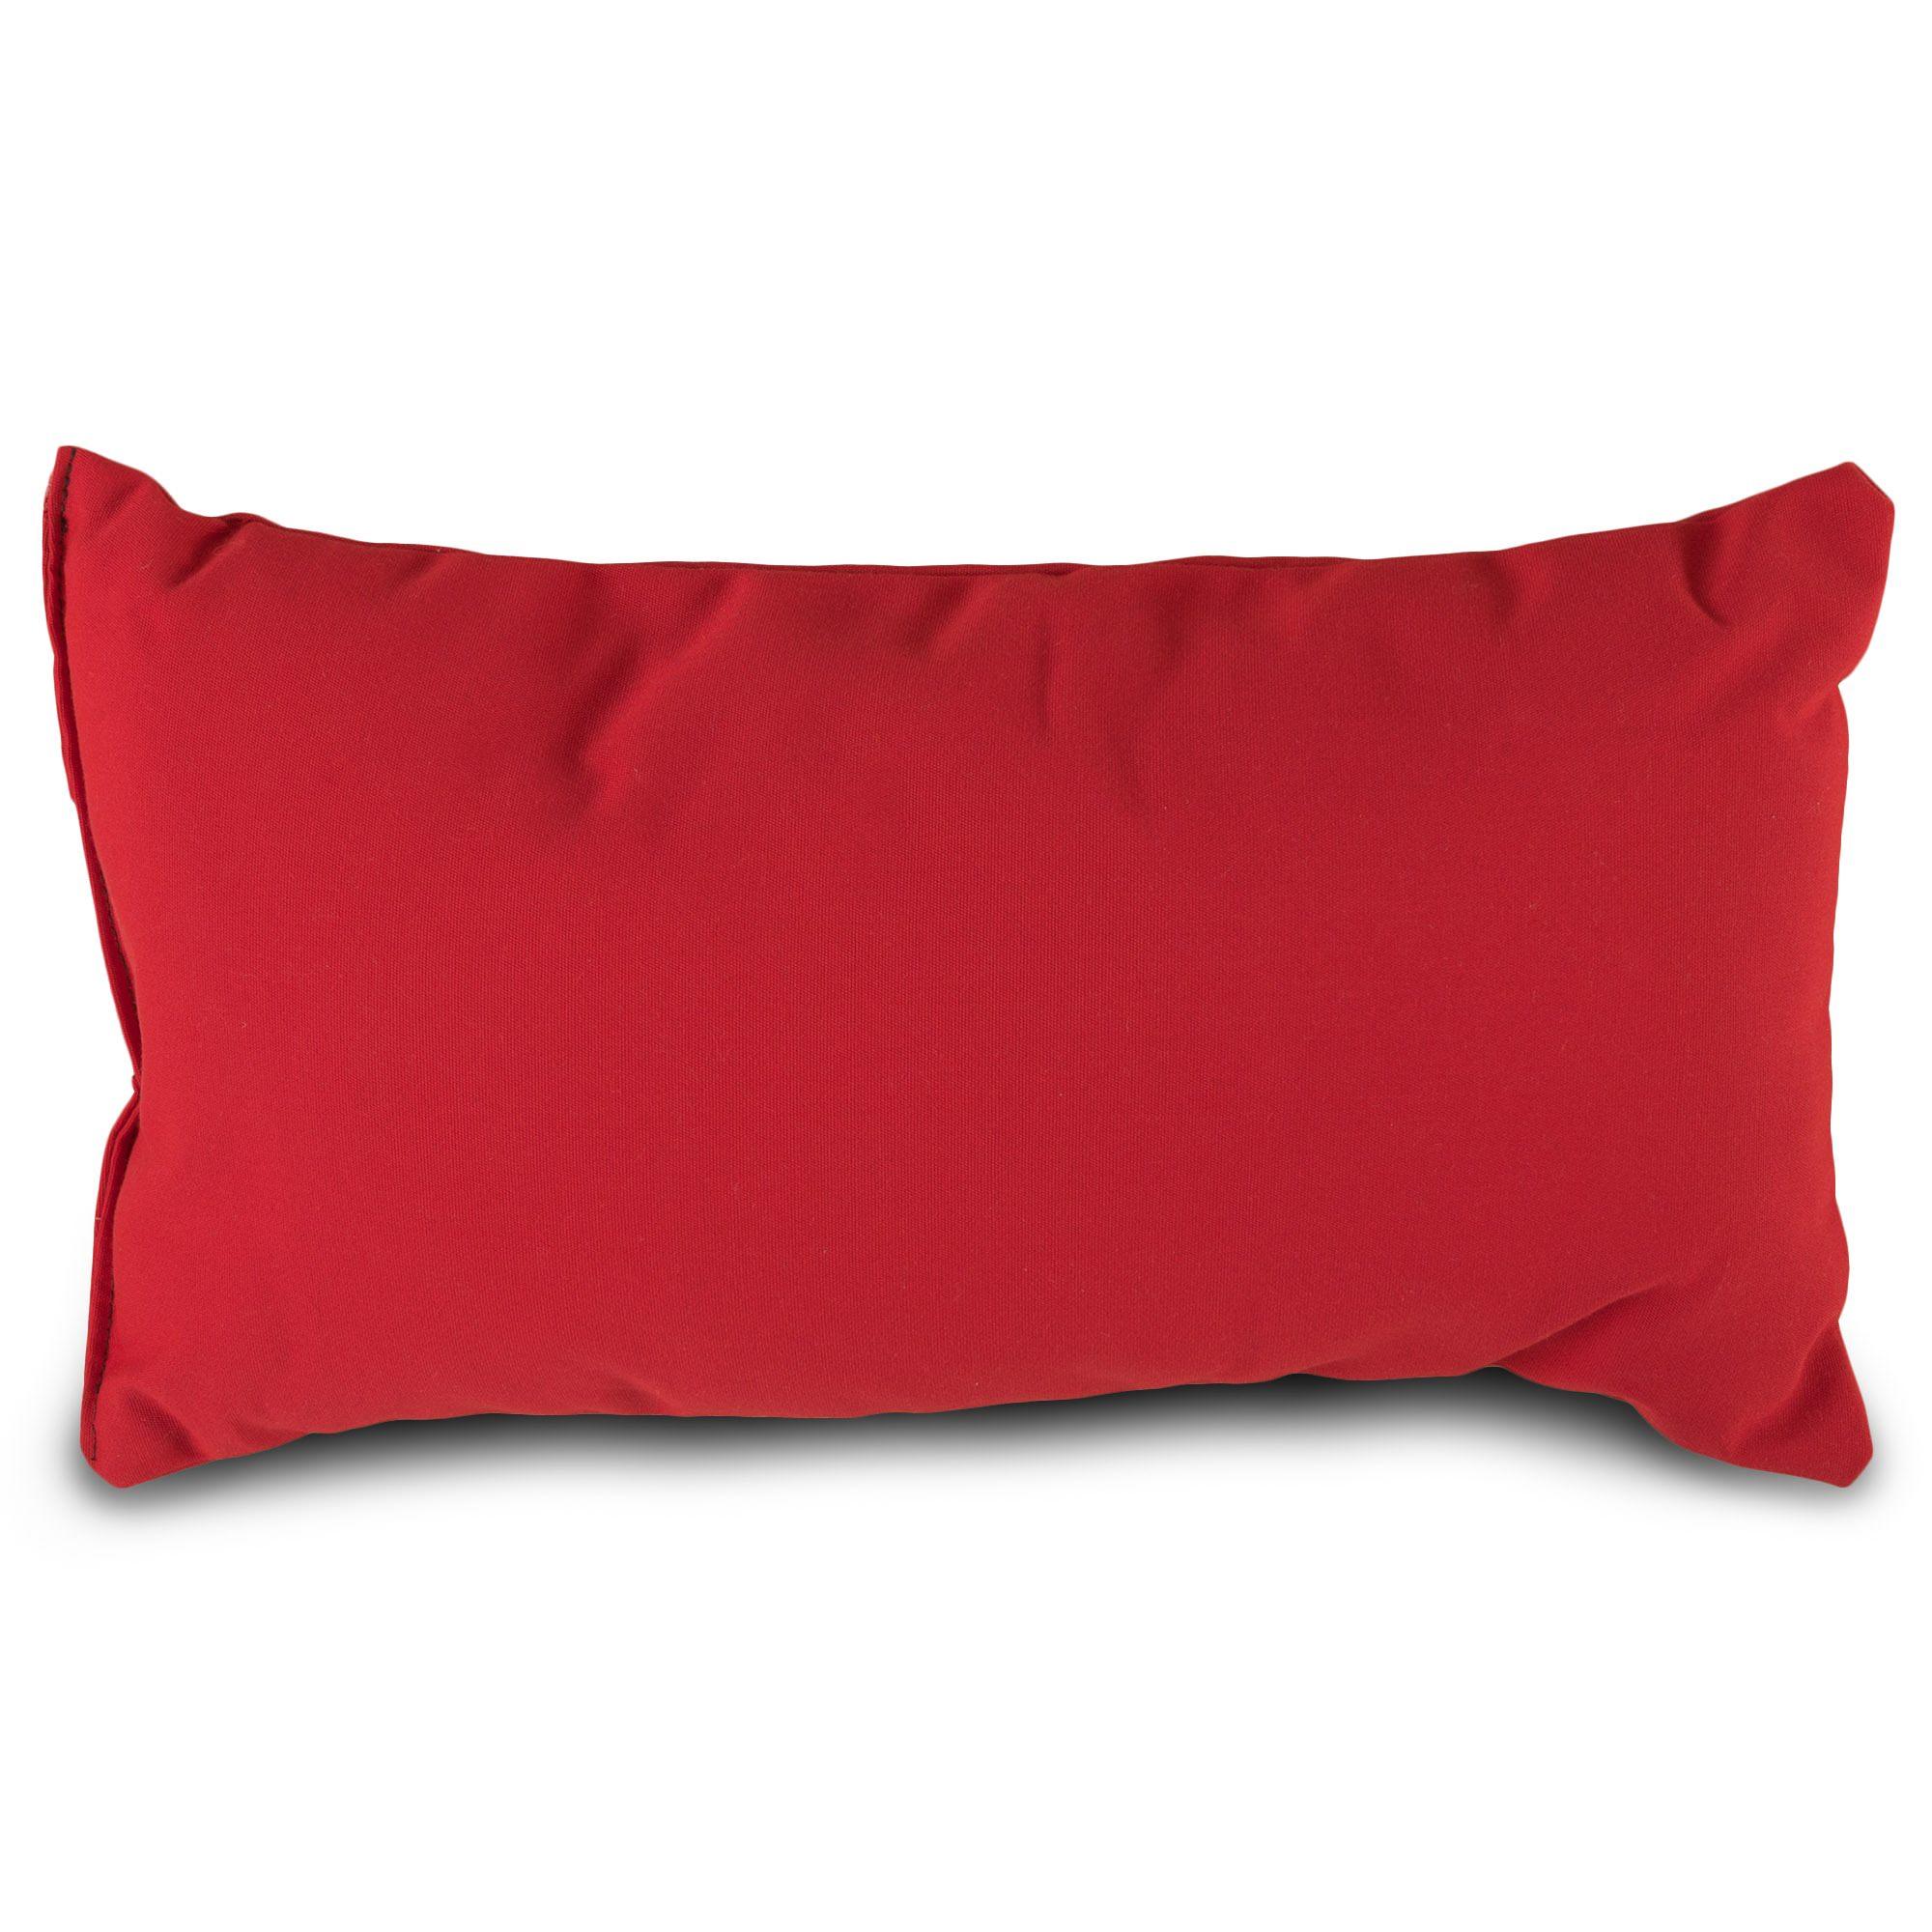 Jockey Red Sunbrella Outdoor Throw Pillow